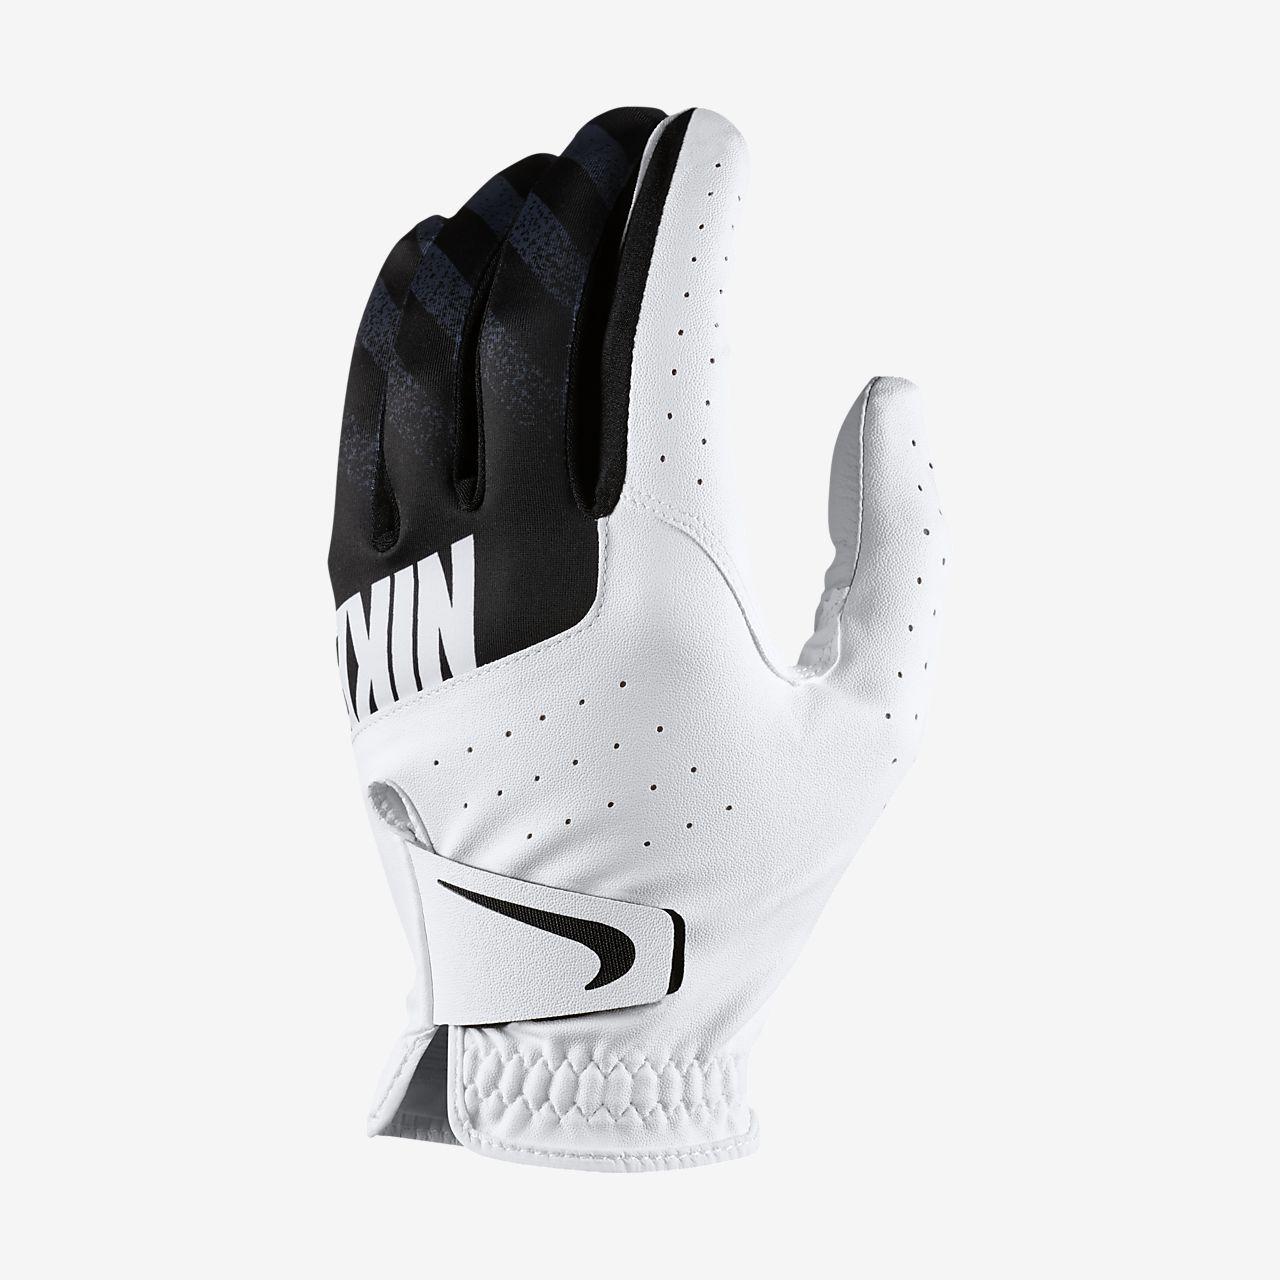 Nike Sport Guante de golf (talla media, izquierdo) - Hombre